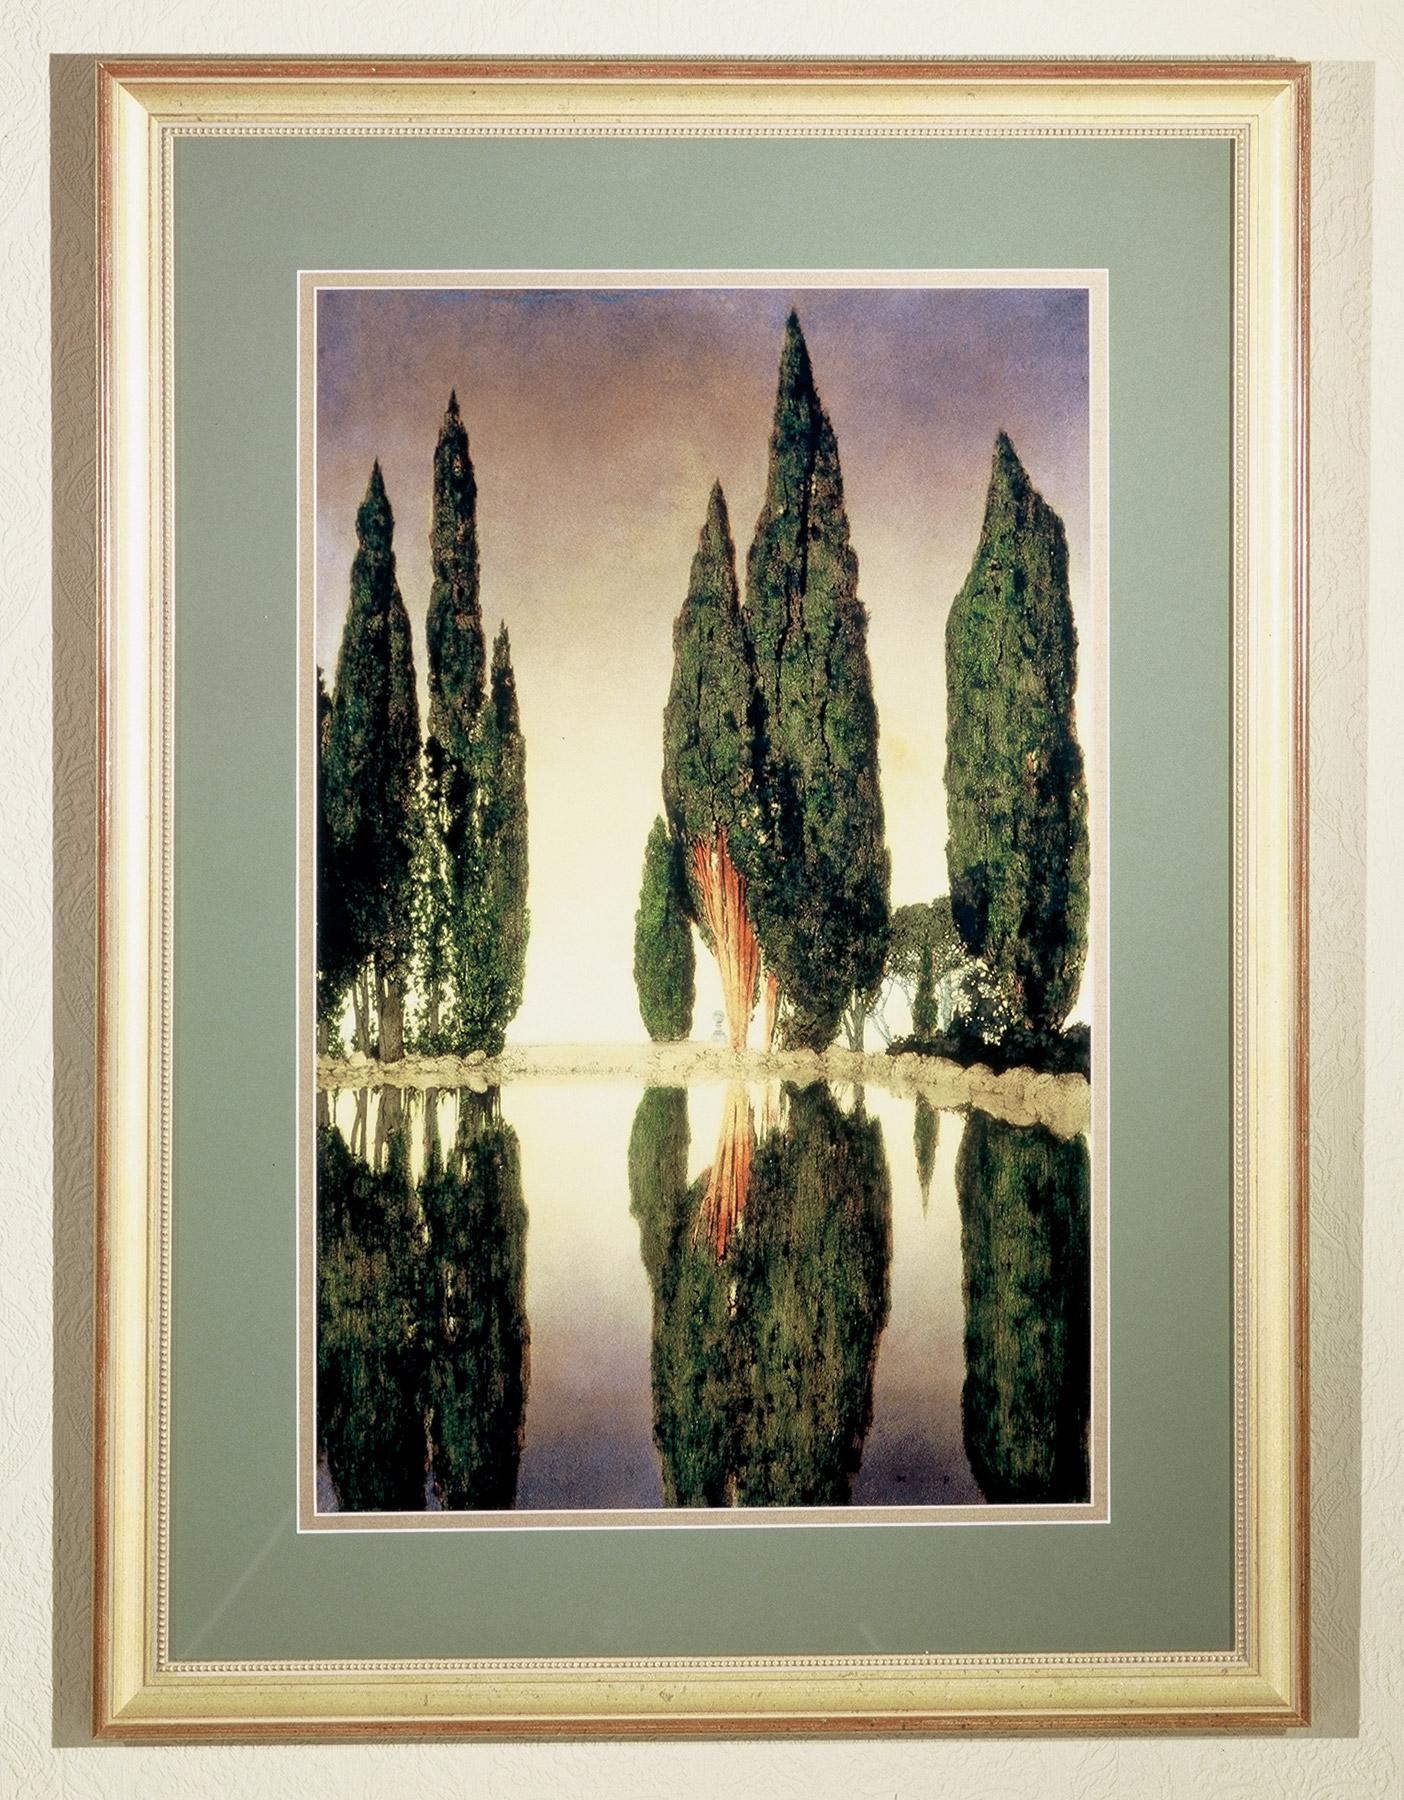 Meyda 46438 Maxfield Parrish Reservoir Framed Art